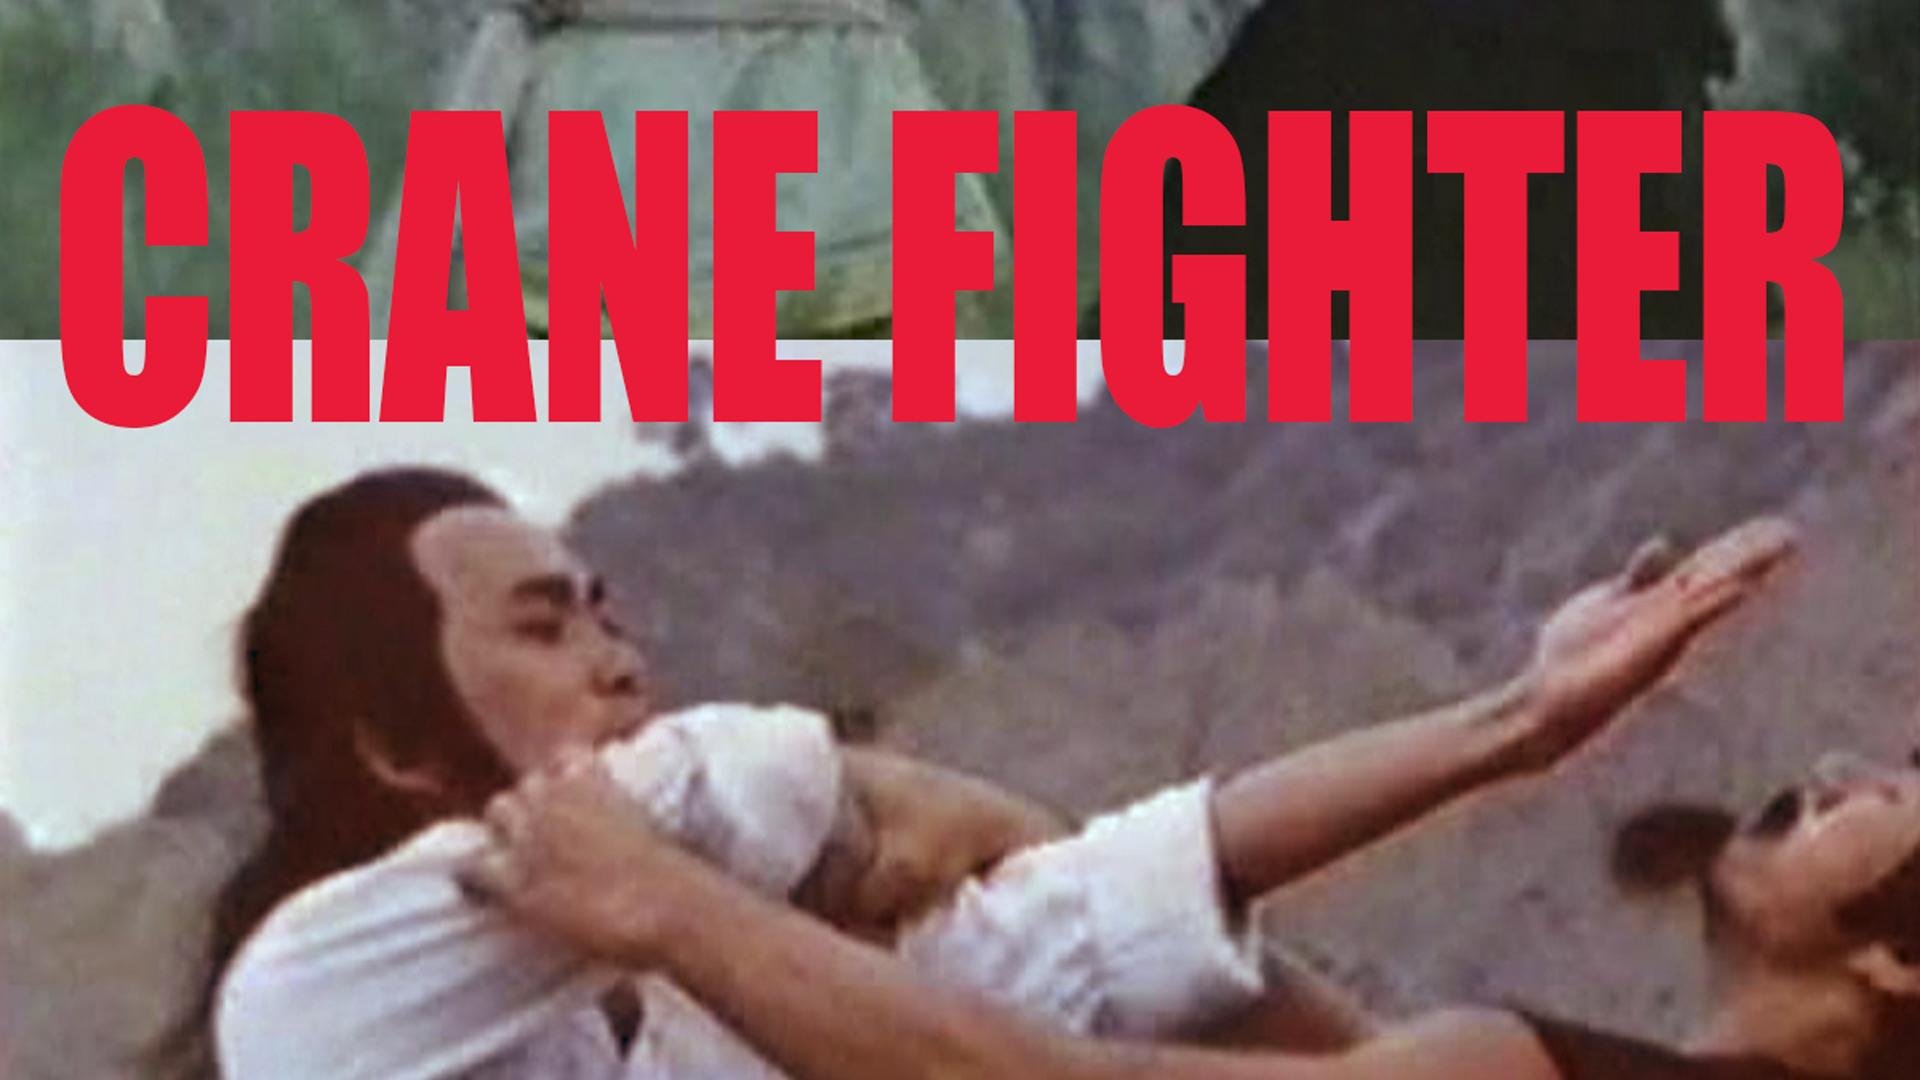 Crane Fighter